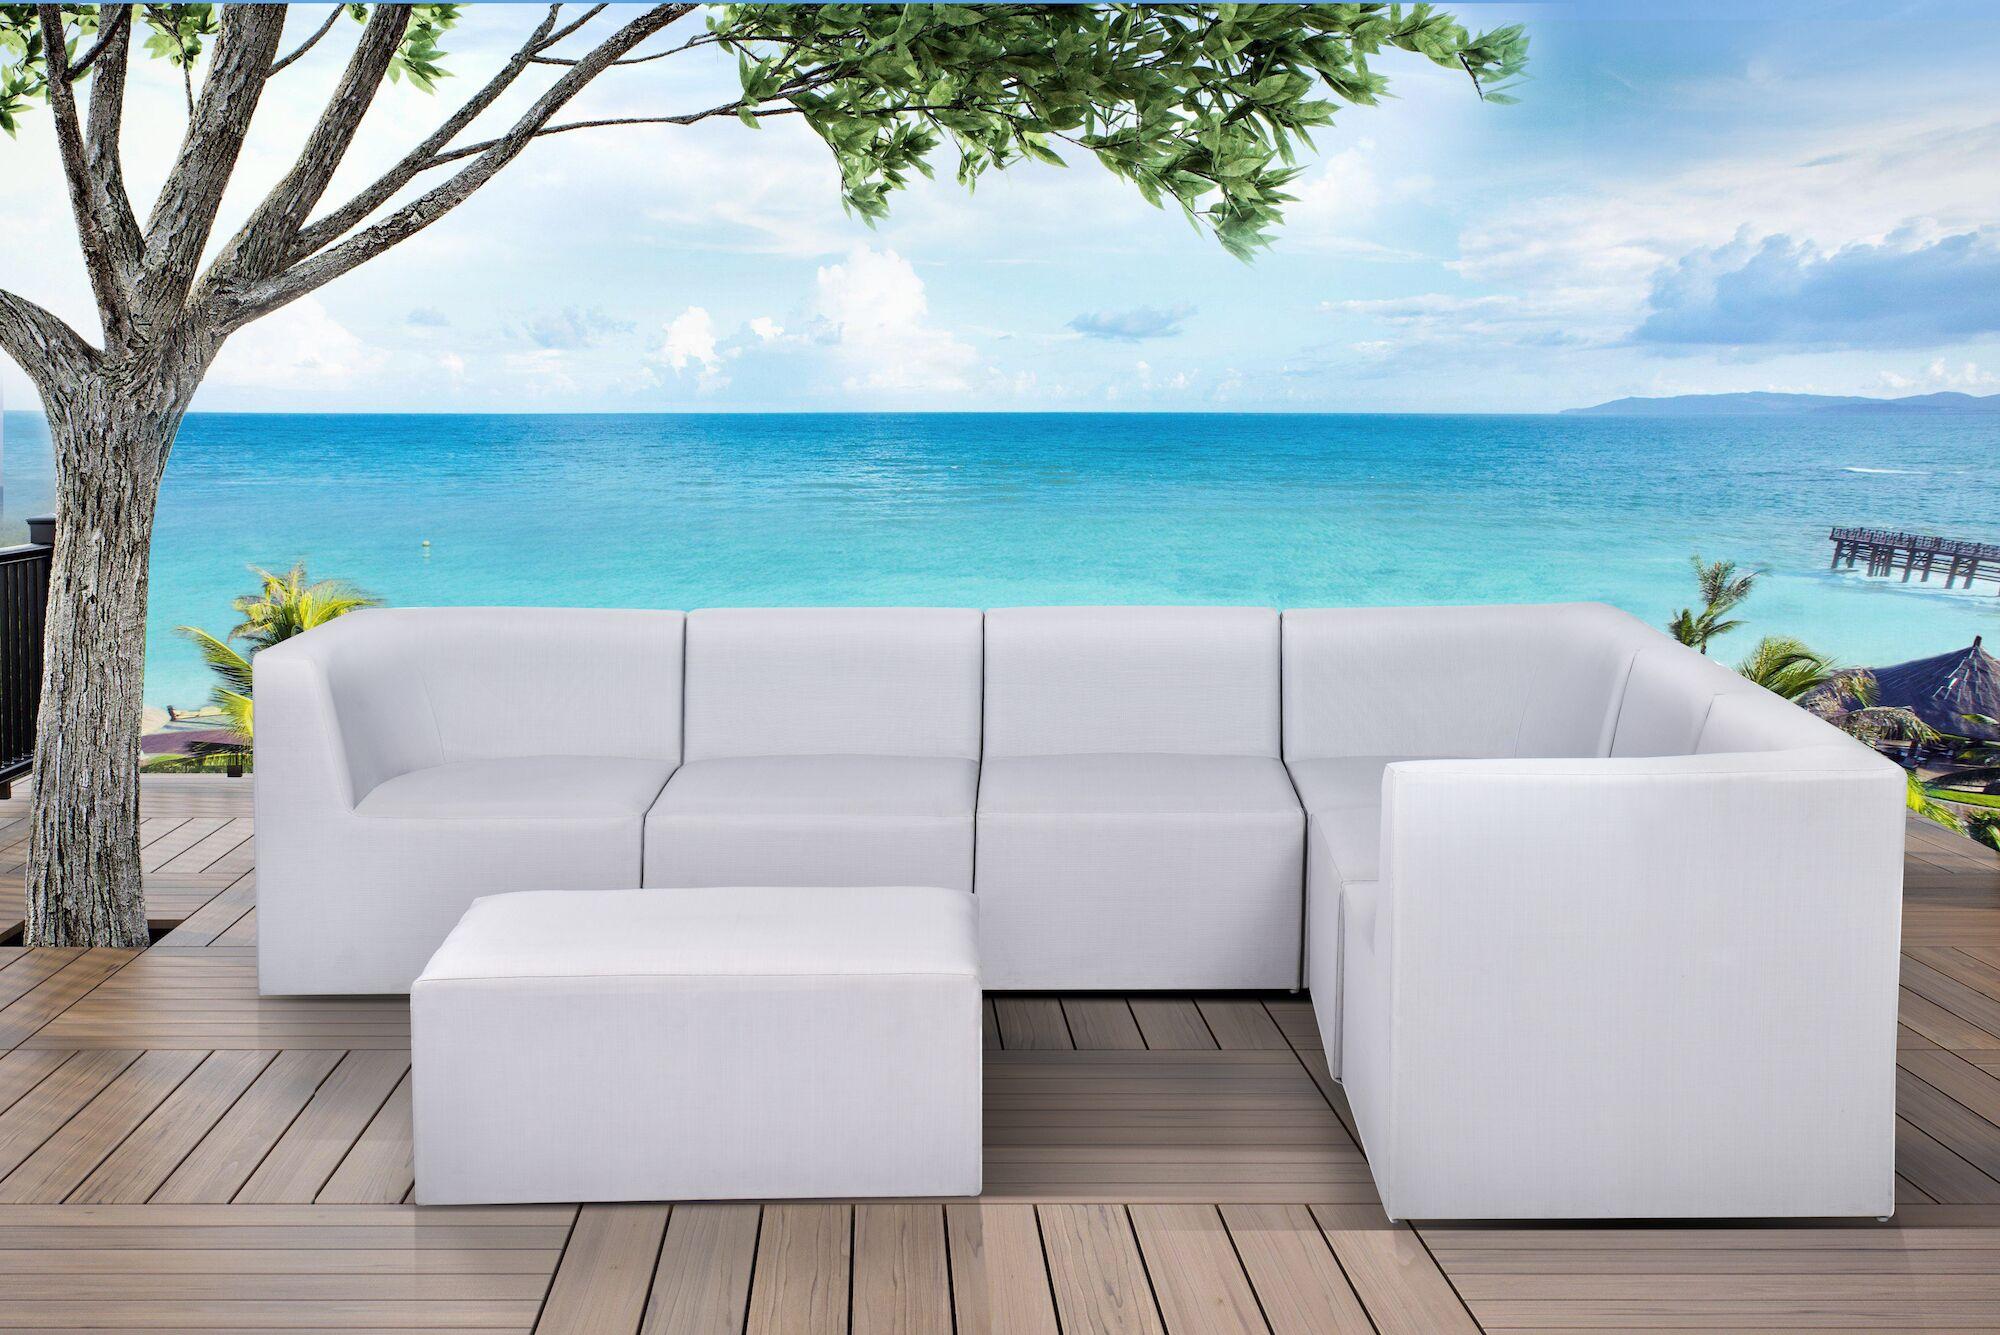 Pruett 7 Piece Modular Sectional with Cushions